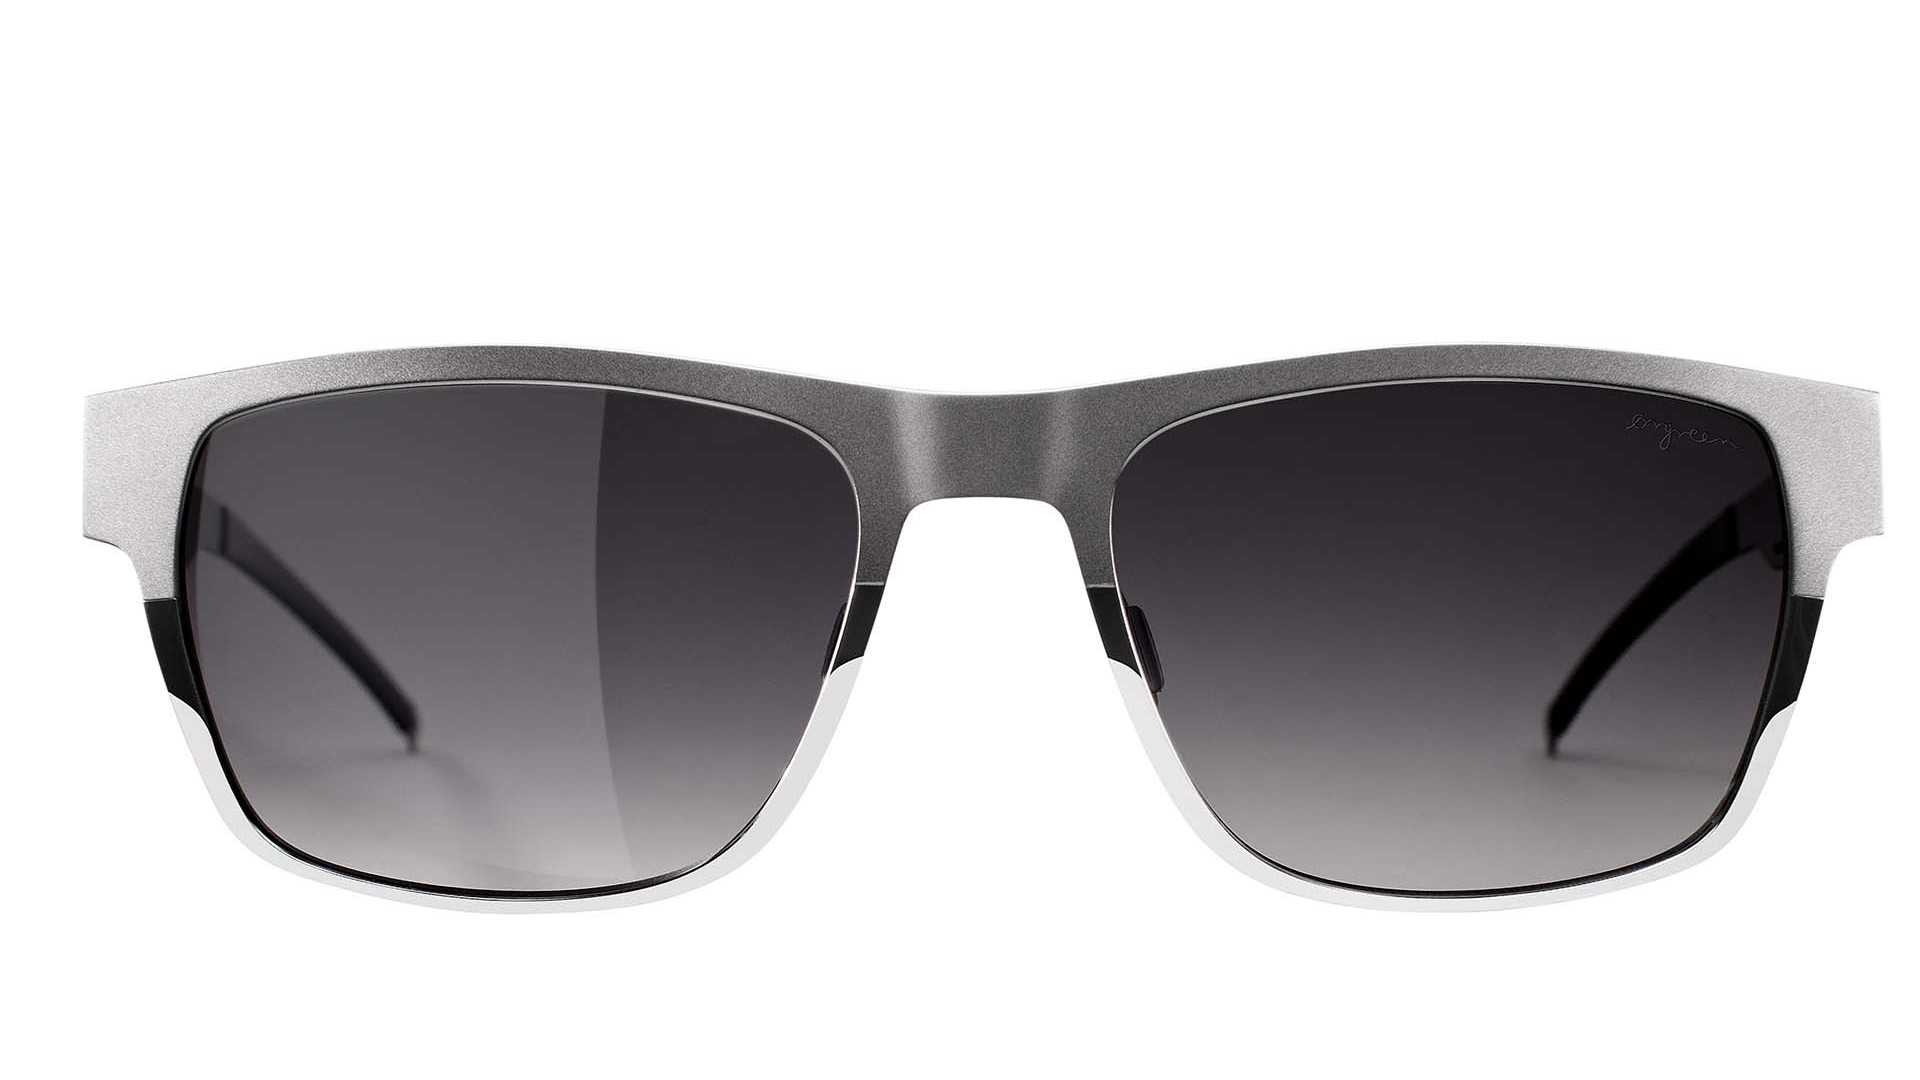 Grand Danois North 5P sunglasses